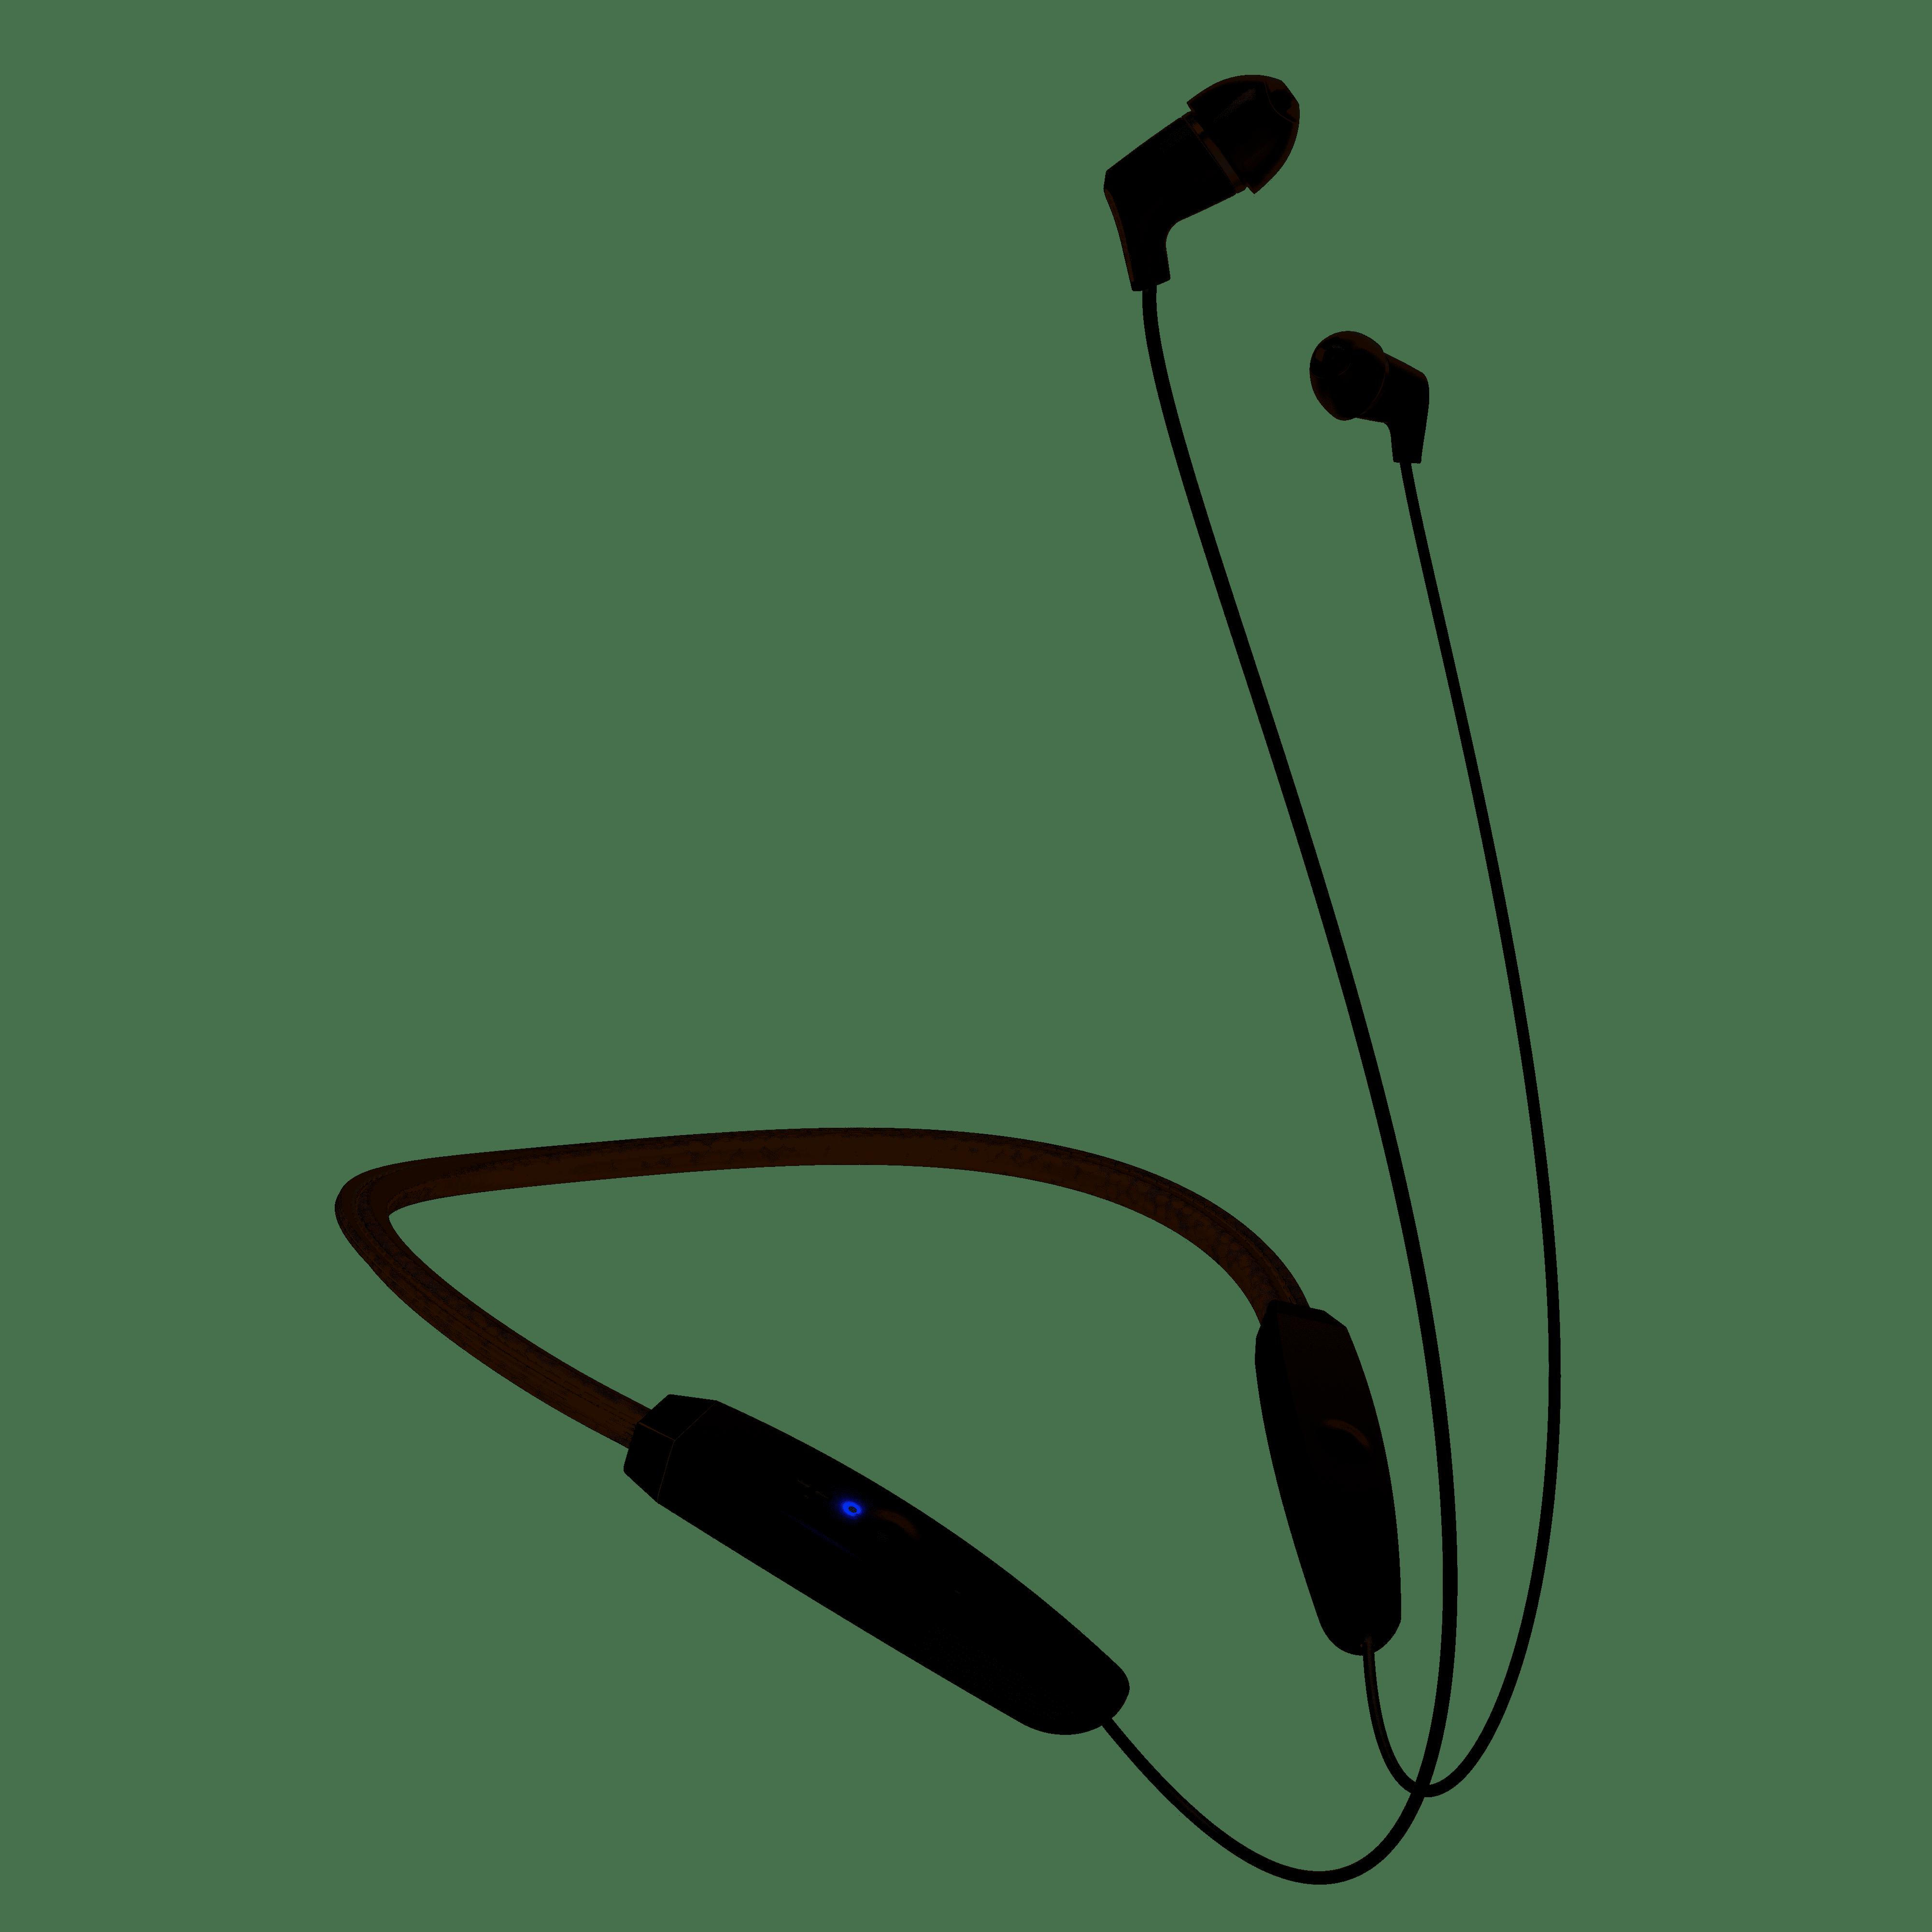 Klipsch R5 Wireless Neckband Headphones - $47.99